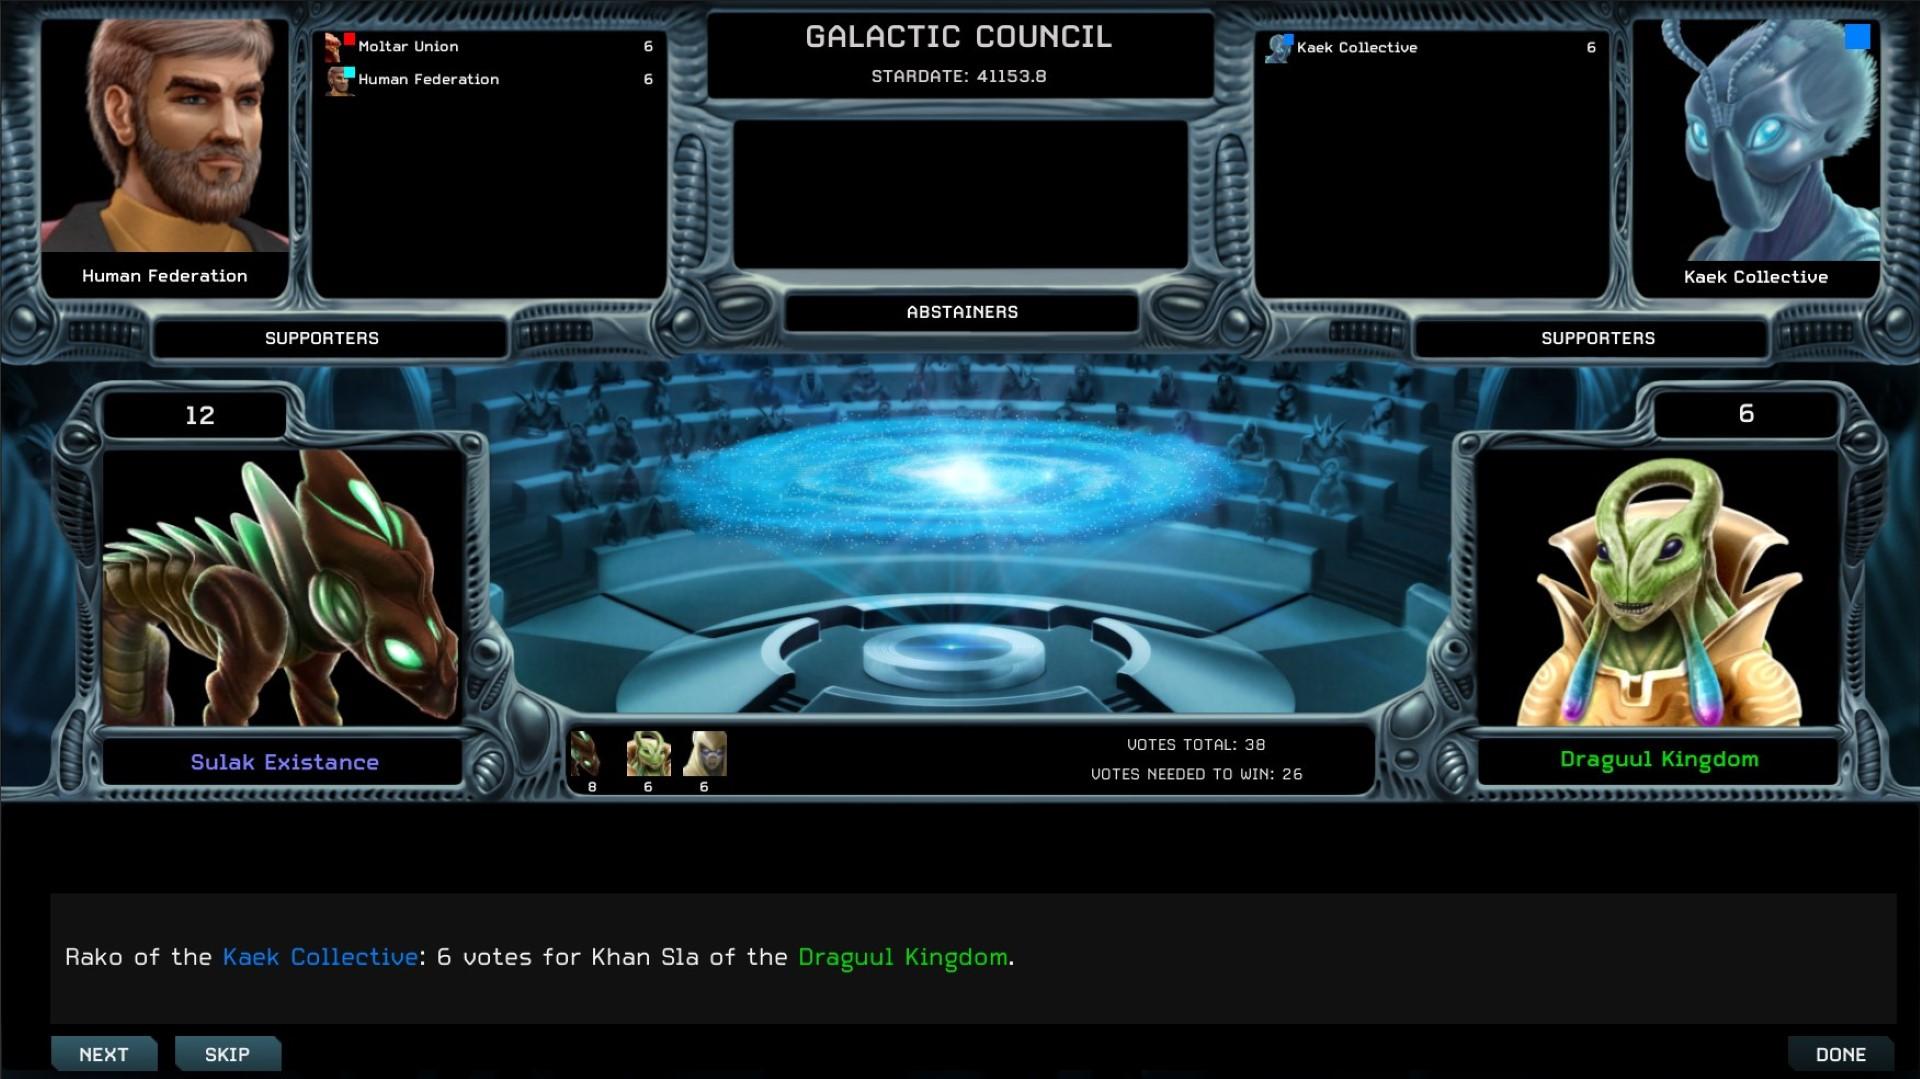 ISG_GalacticCouncil_Beta.jpg